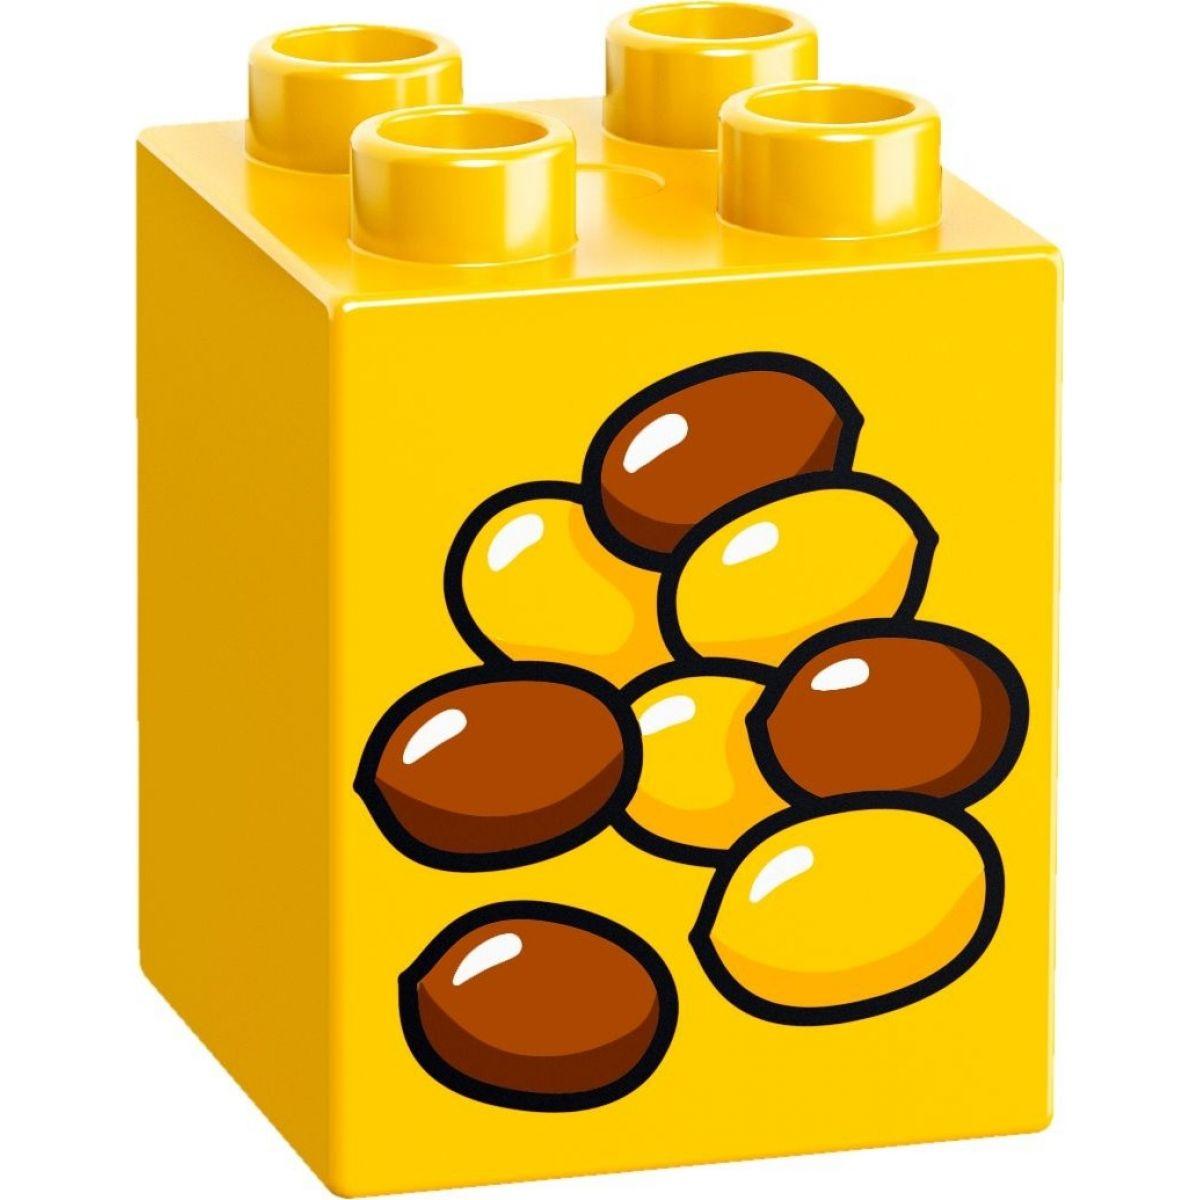 LEGO DUPLO 10858 Moji první skládací mazlíčci #4